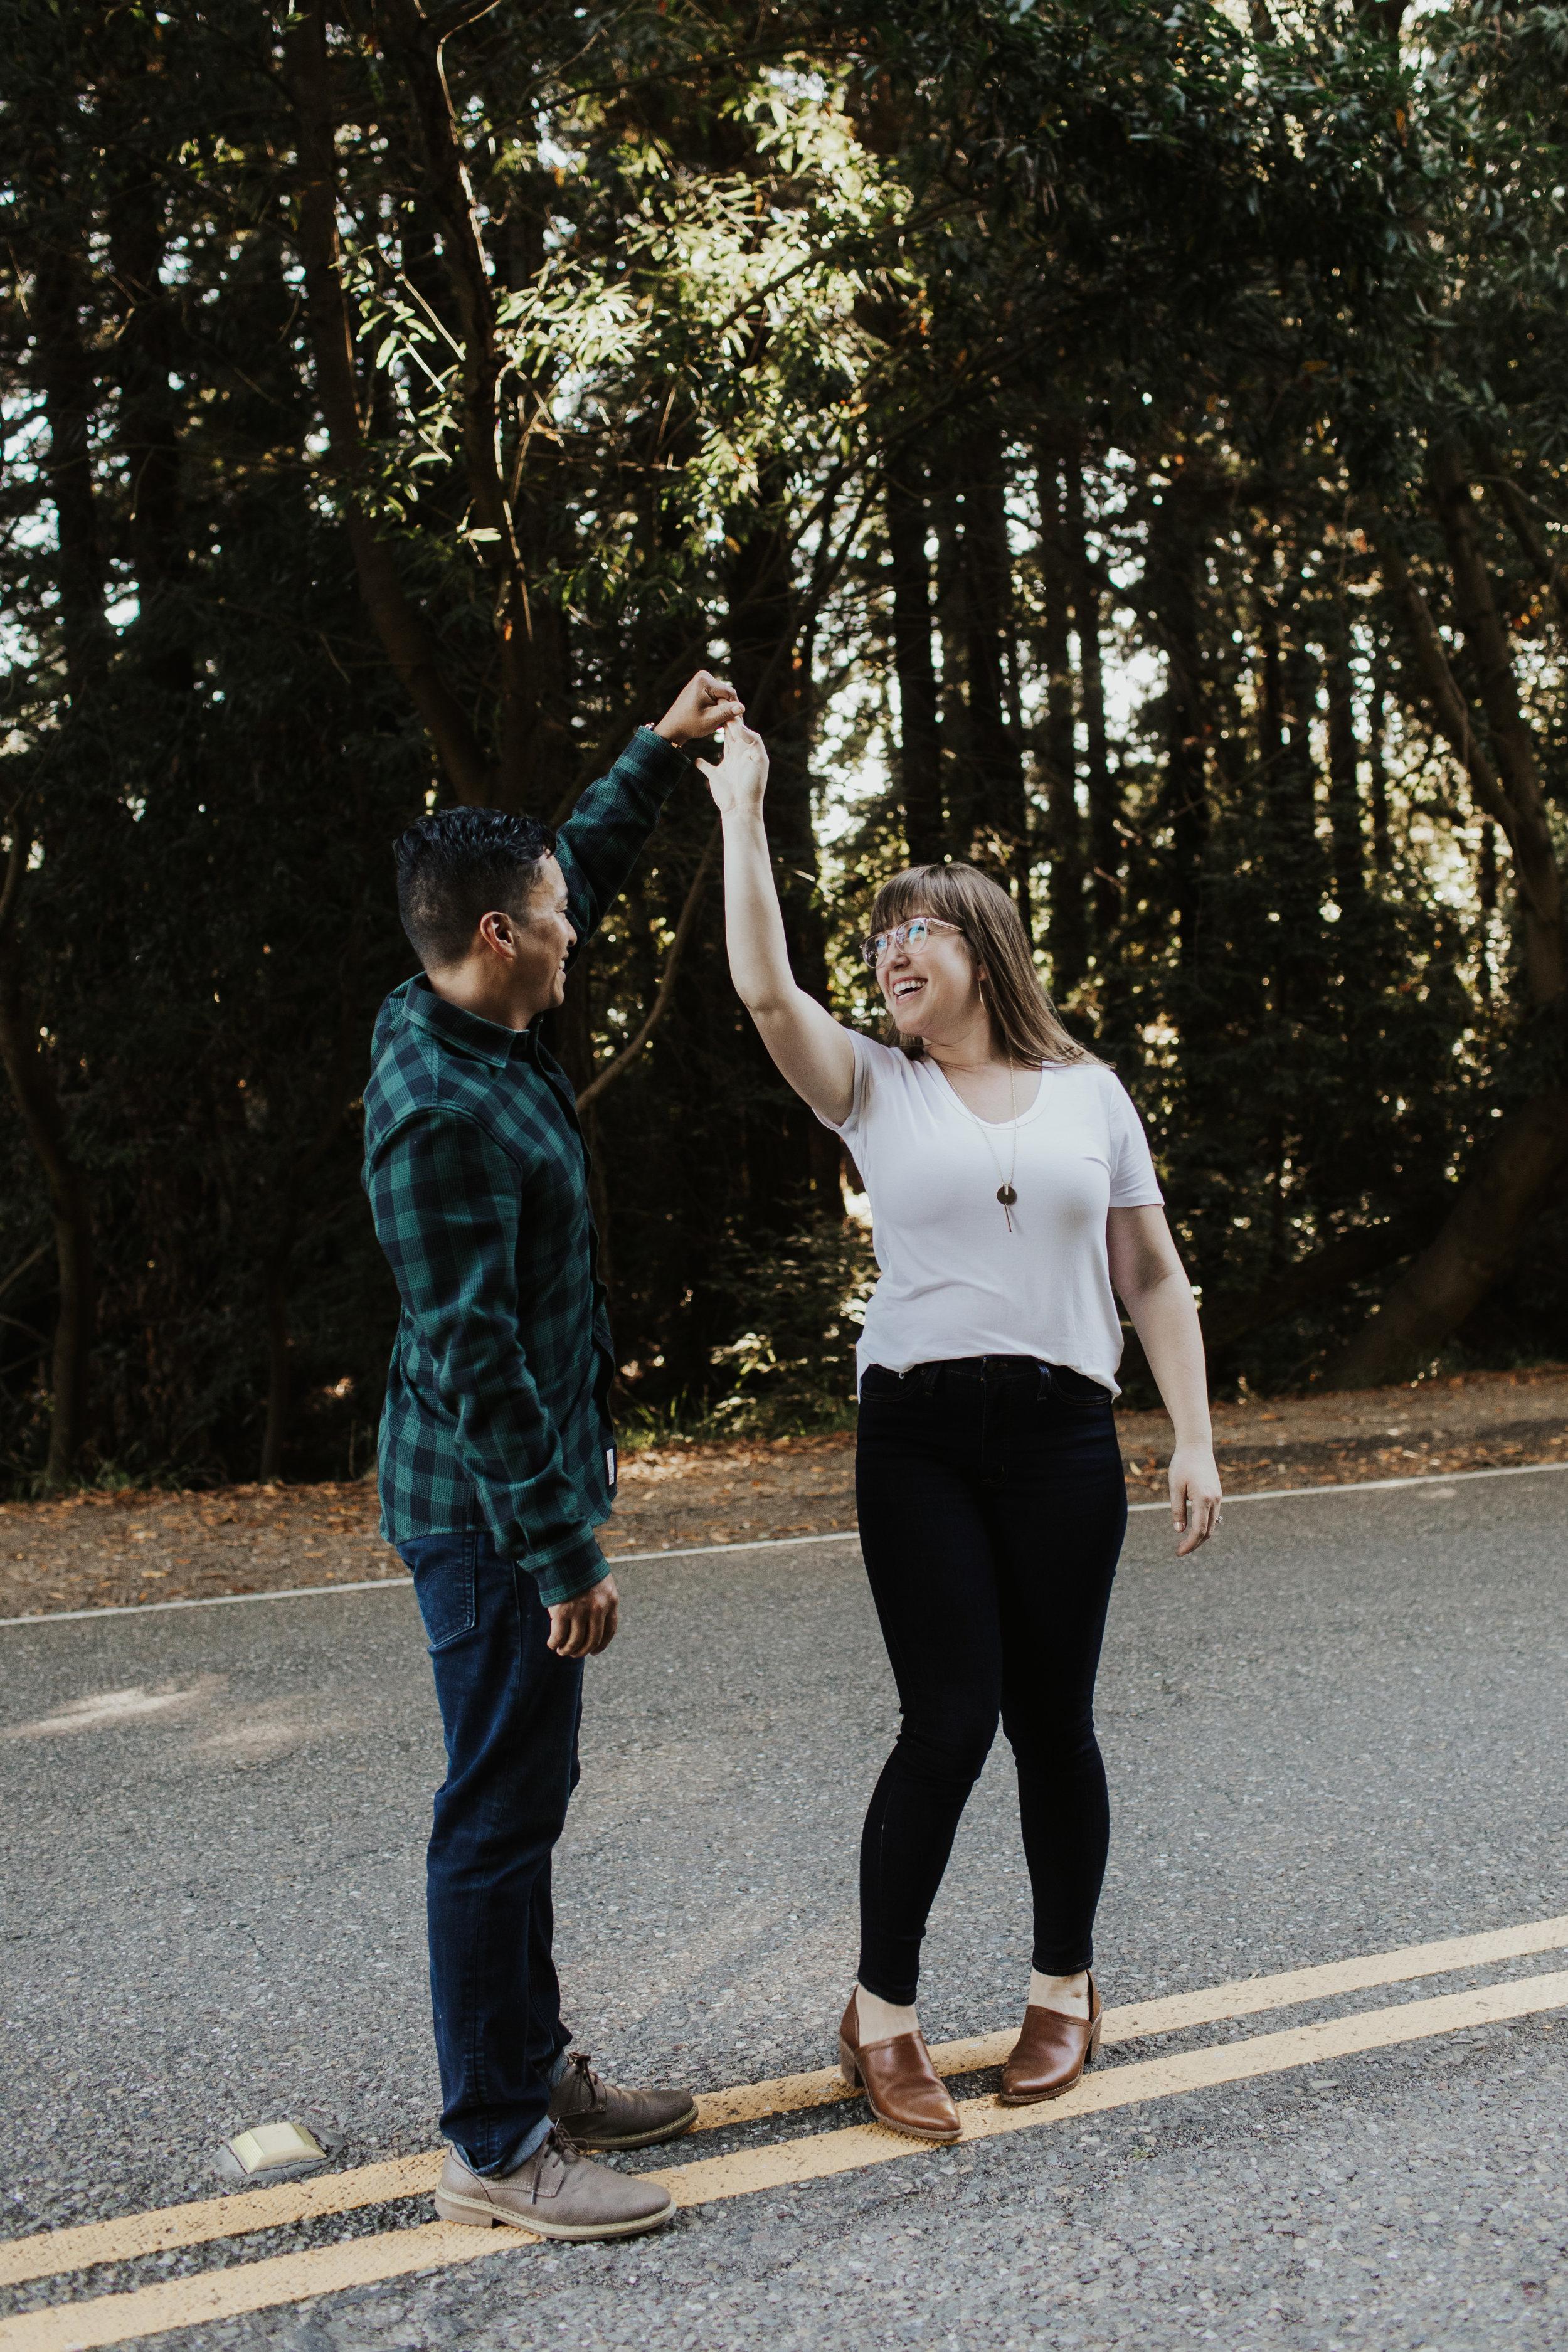 Erin-Rene-Kramer-Finished-San-Francisco-Redwoods-Legion-of-Honor-Sutro-Baths-Engagement-Session-with-Dog-47.jpg